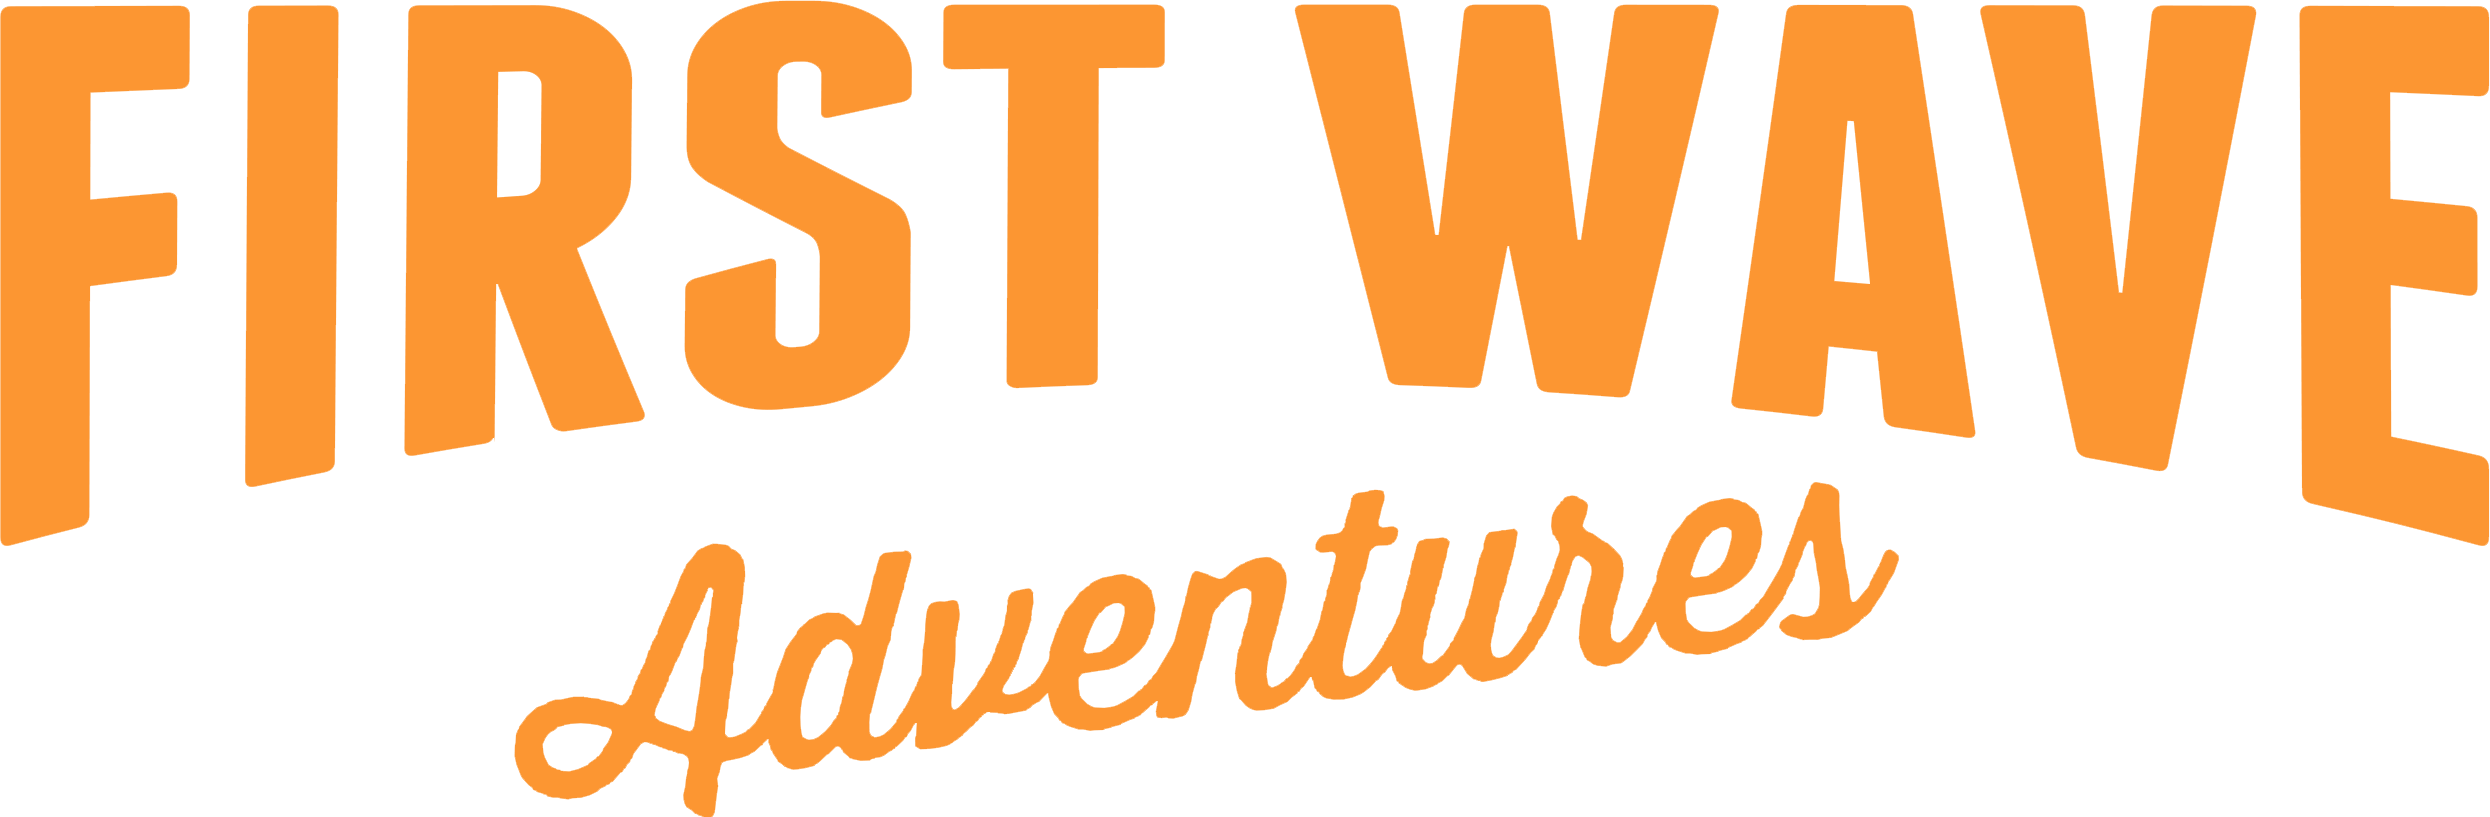 FWA logo abv.png